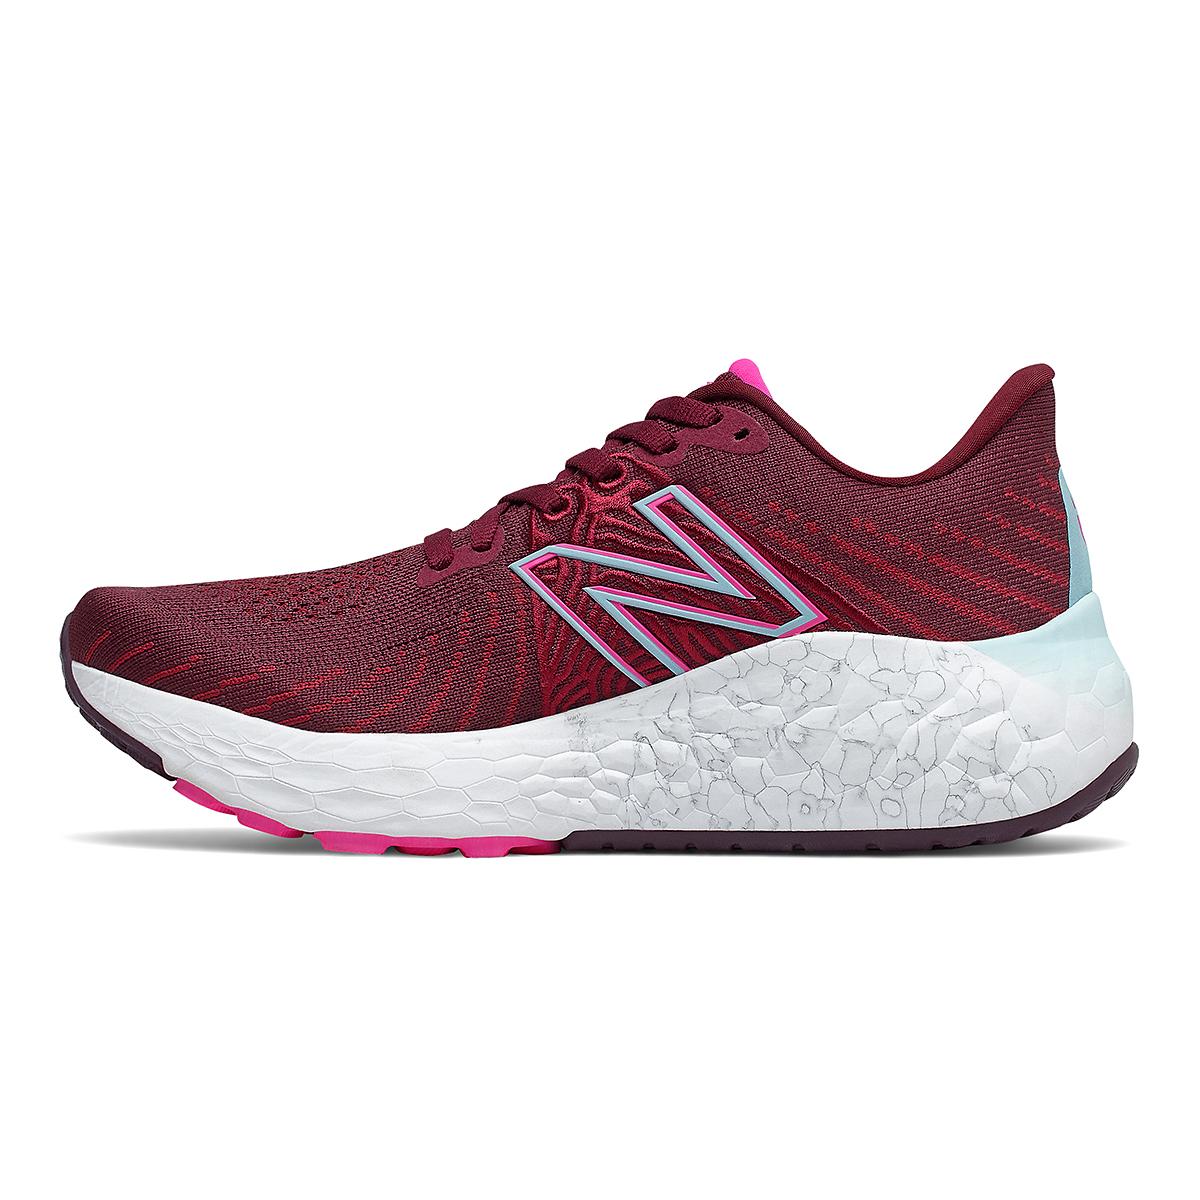 Women's New Balance Fresh Foam Vongo V5 Running Shoe - Color: Garnet/Pink Glo - Size: 5 - Width: Regular, Garnet/Pink Glo, large, image 2